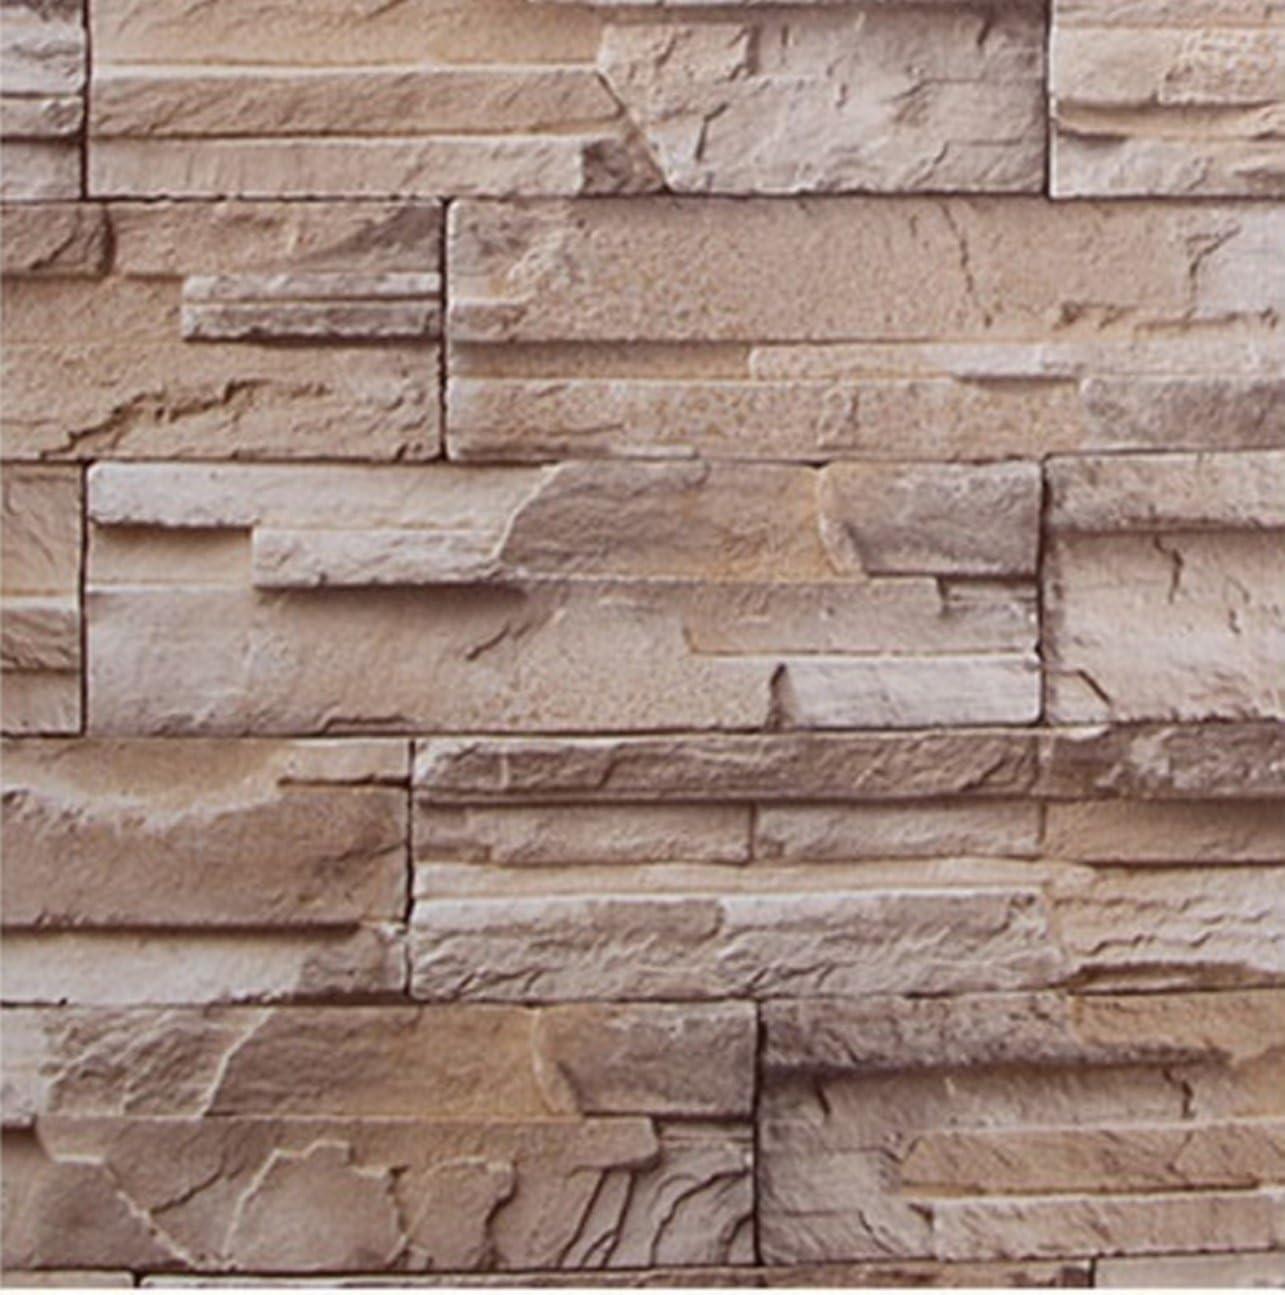 Amazon Yullymerry 壁紙シール レンガ ブロック 模様 61cm 10m ブリックパターン ストーン Diy 模様替え 浅黄 壁紙